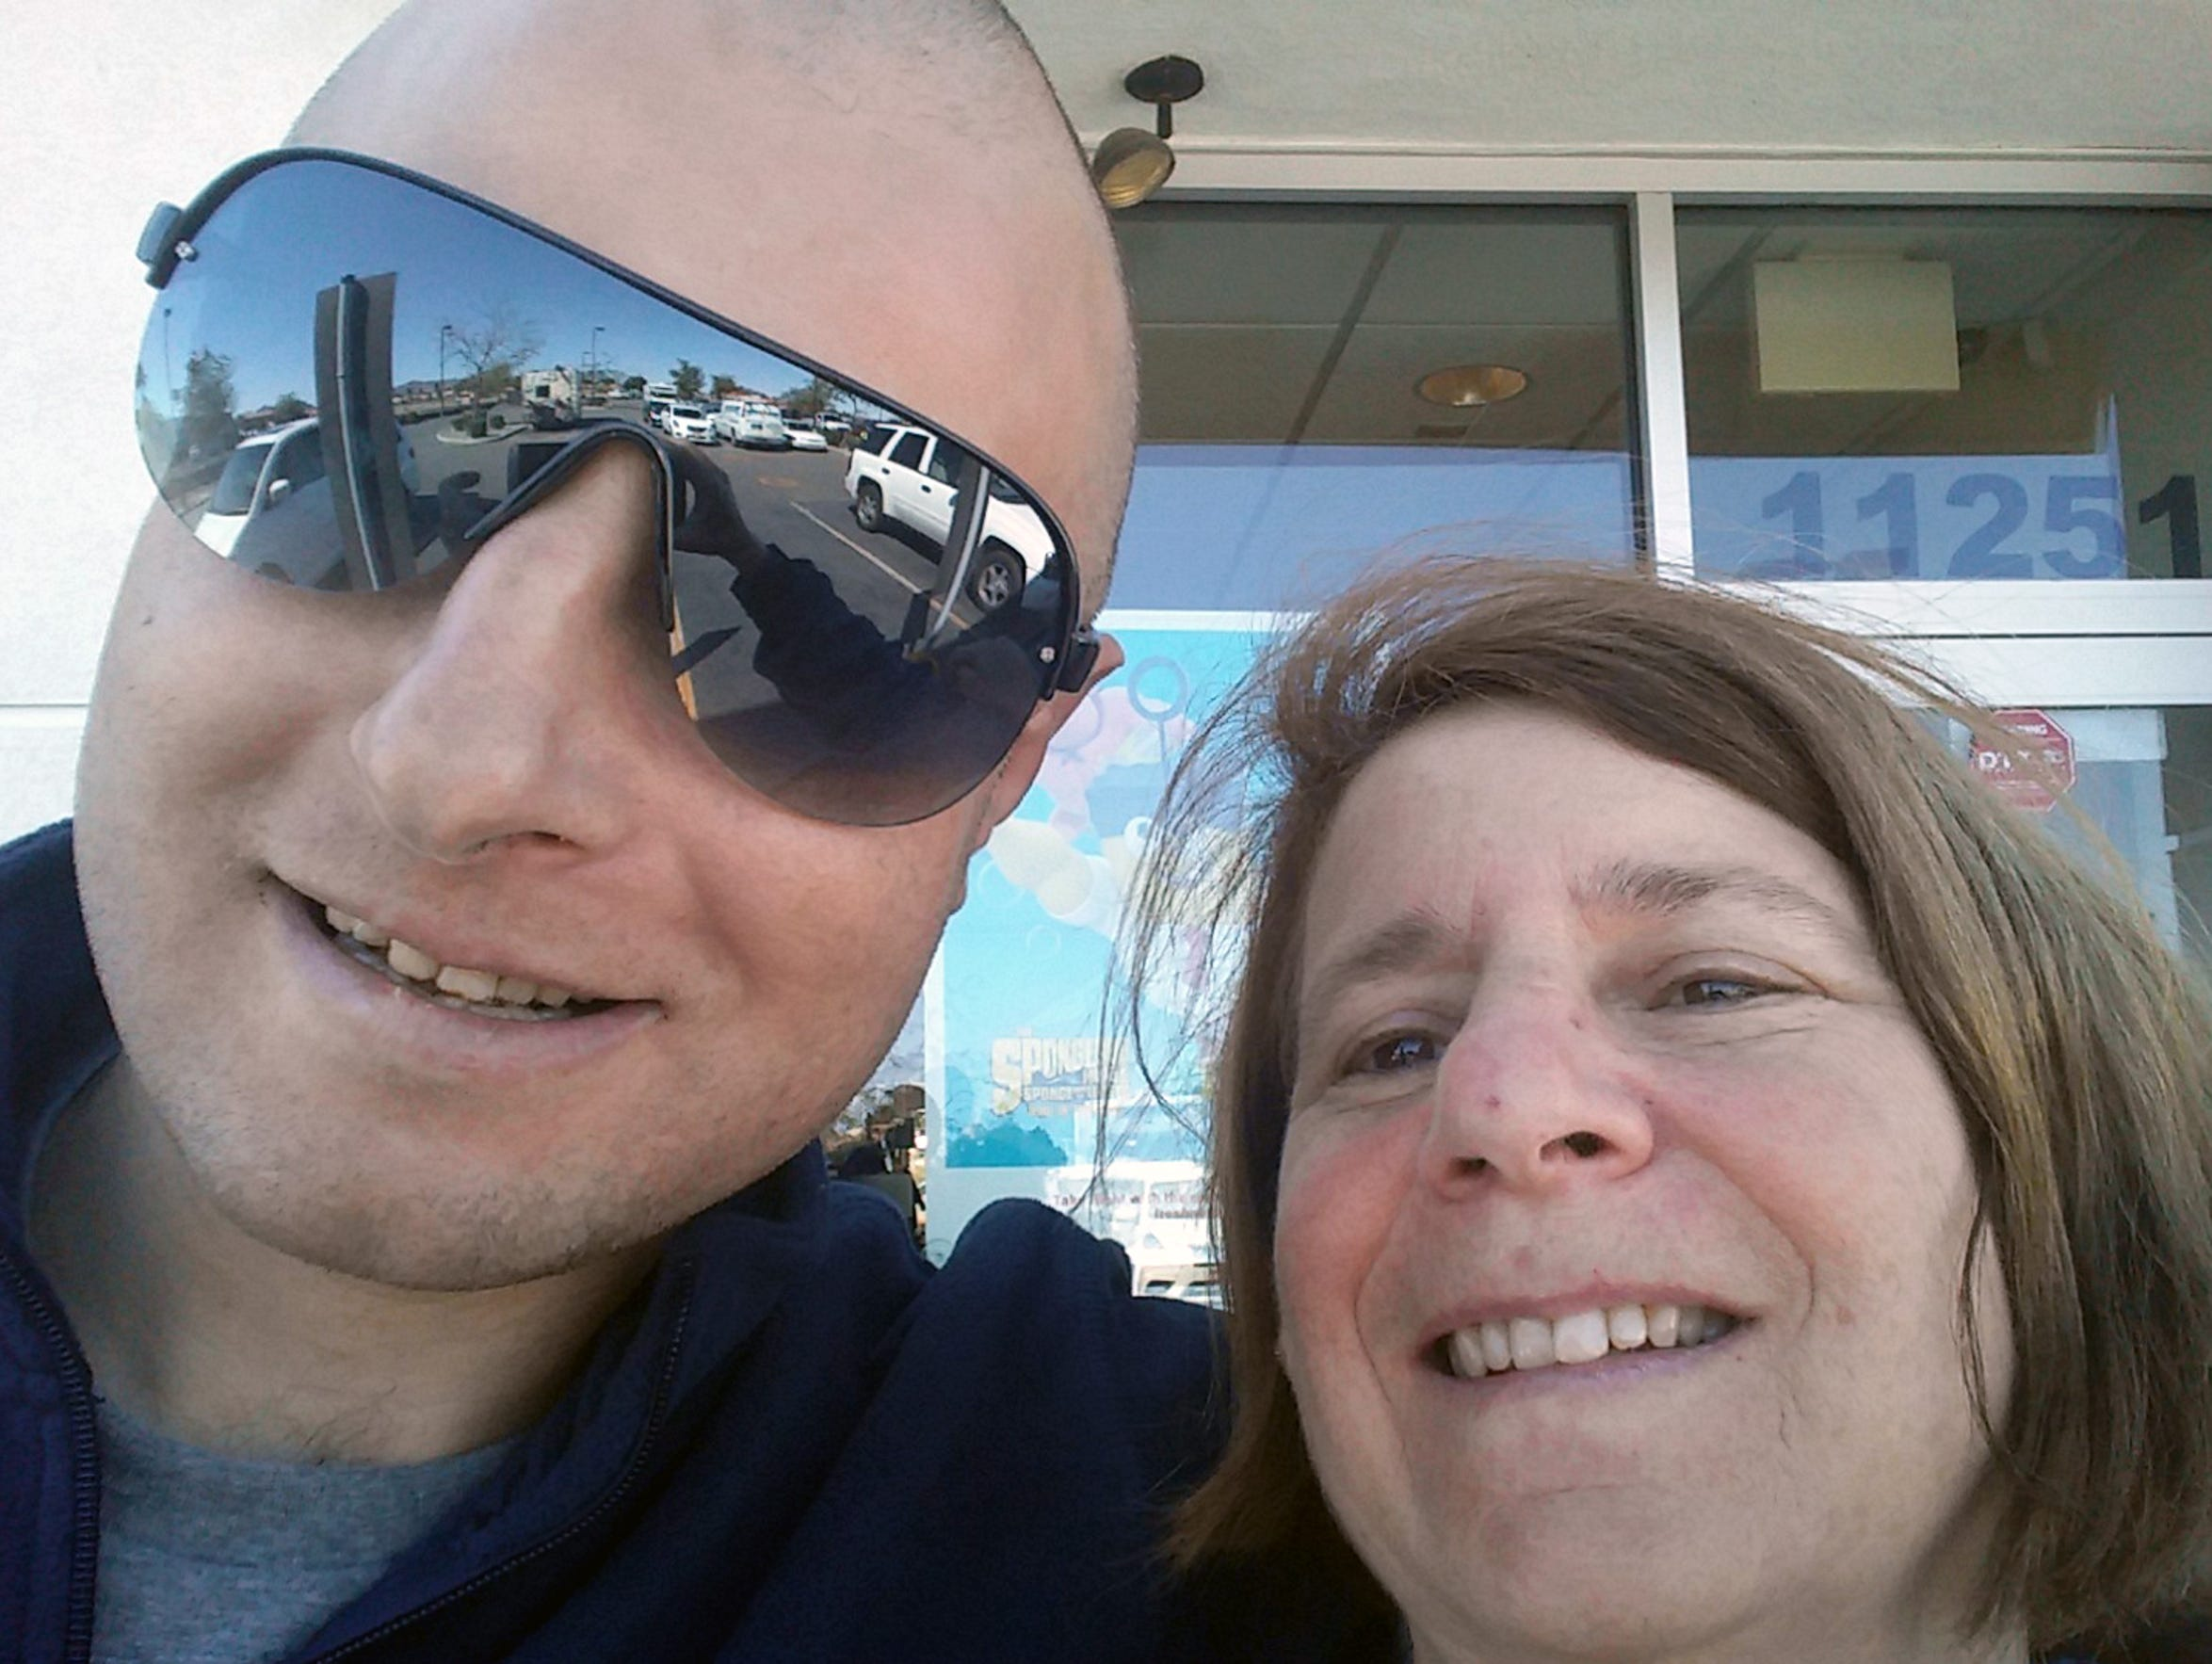 Curtis Goldman and his mother, Deborah Goldman, are